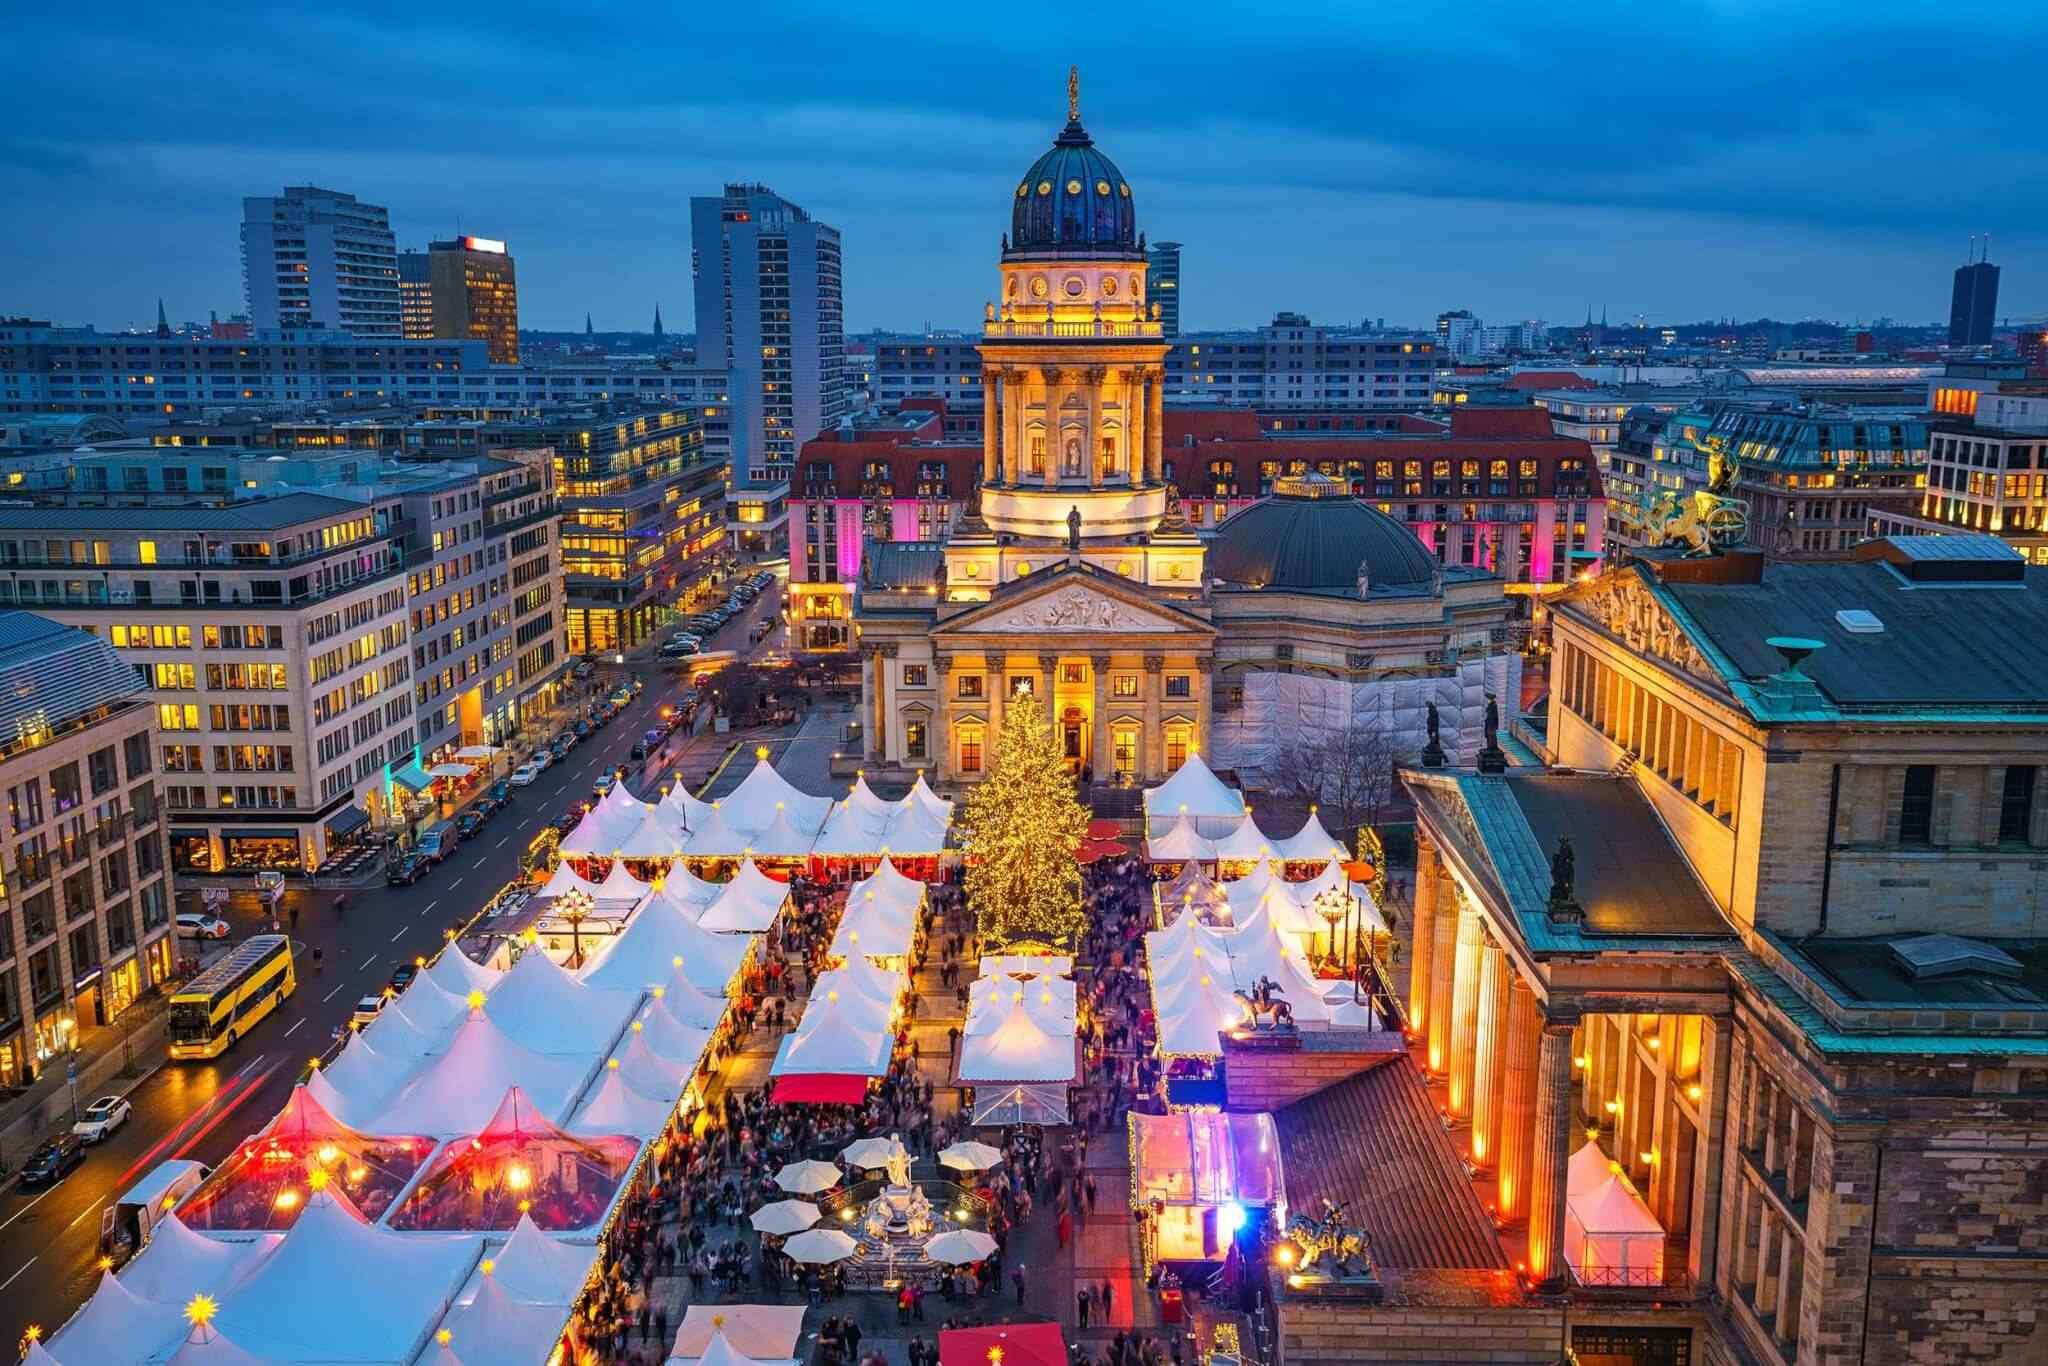 https://go2bulgaria.eu/wp-content/uploads/2018/09/destination-berlin-07.jpg